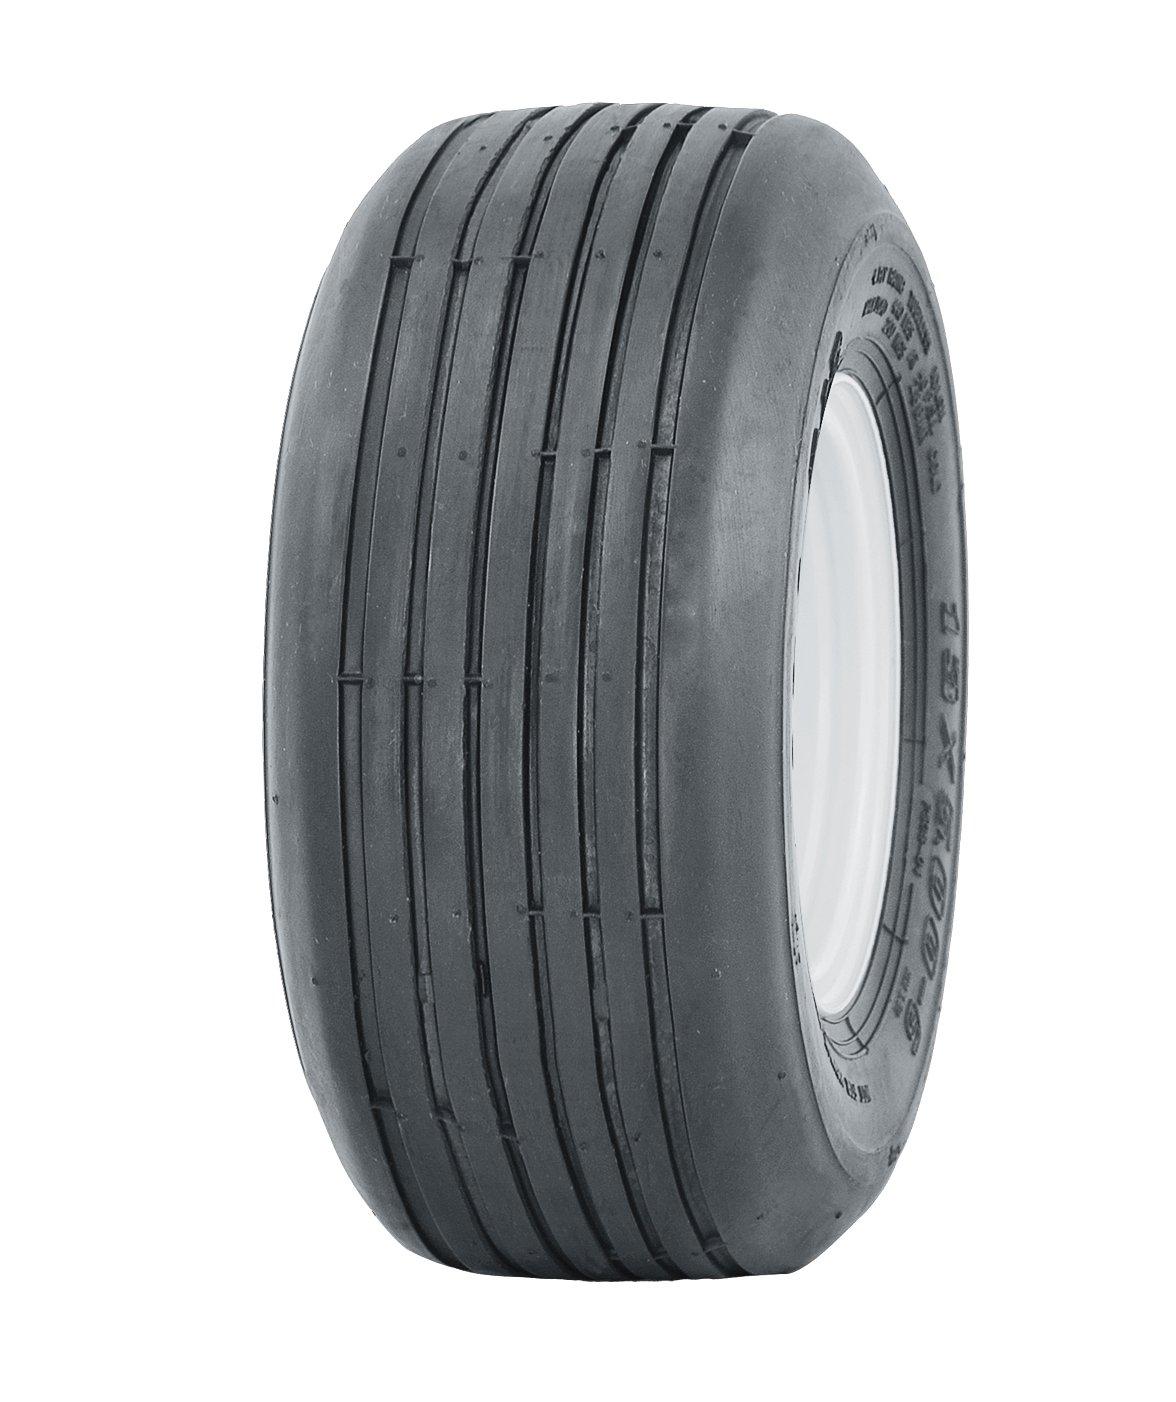 Hi-Run LG Rib Lawn & Garden Tire -11/400-5 WD1090